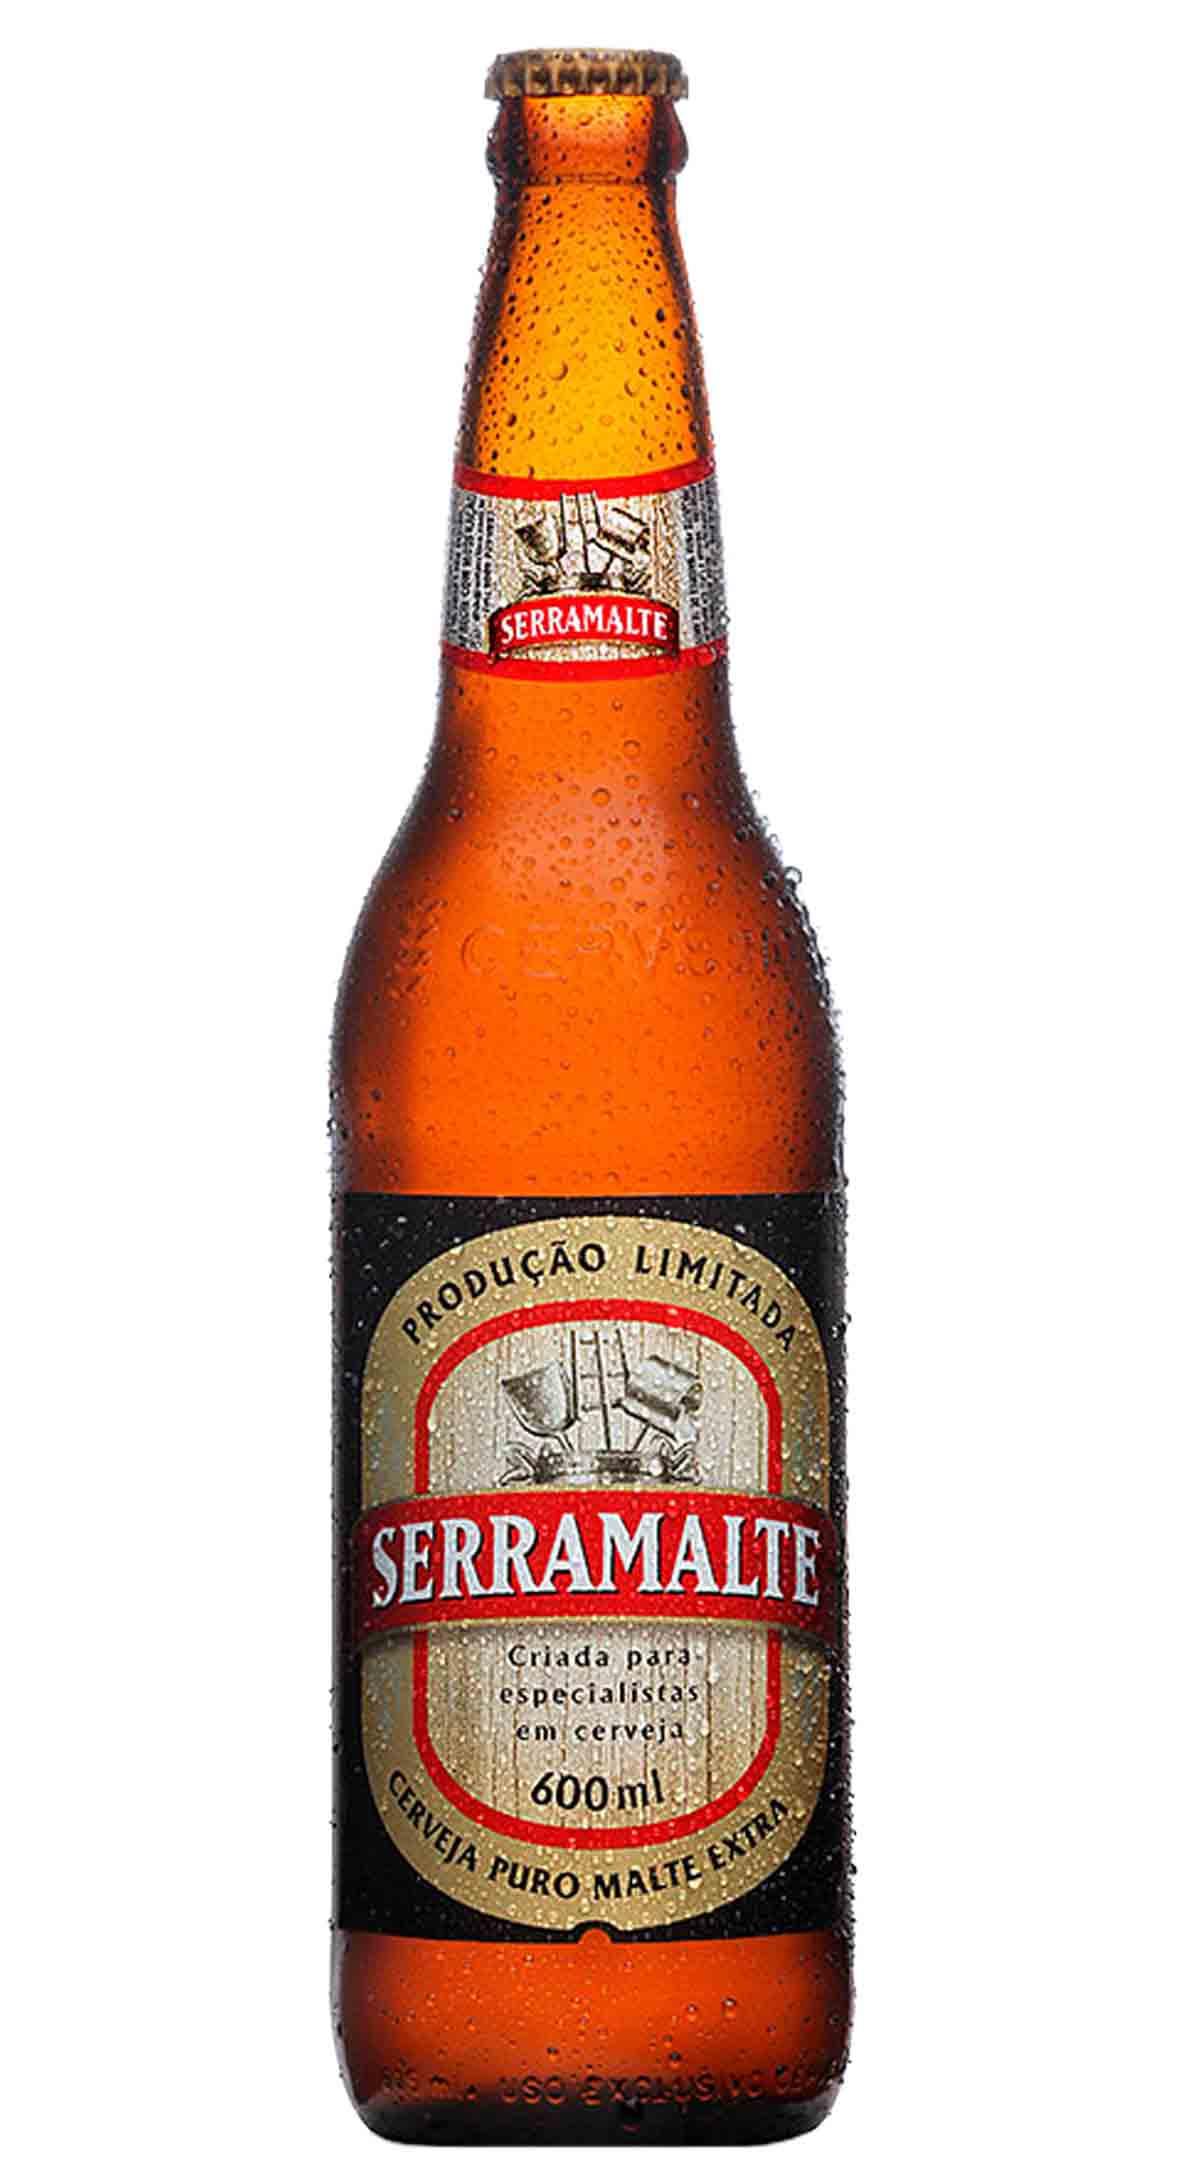 Cerveja Serramalte 600 ml - Imigrantes Bebidas